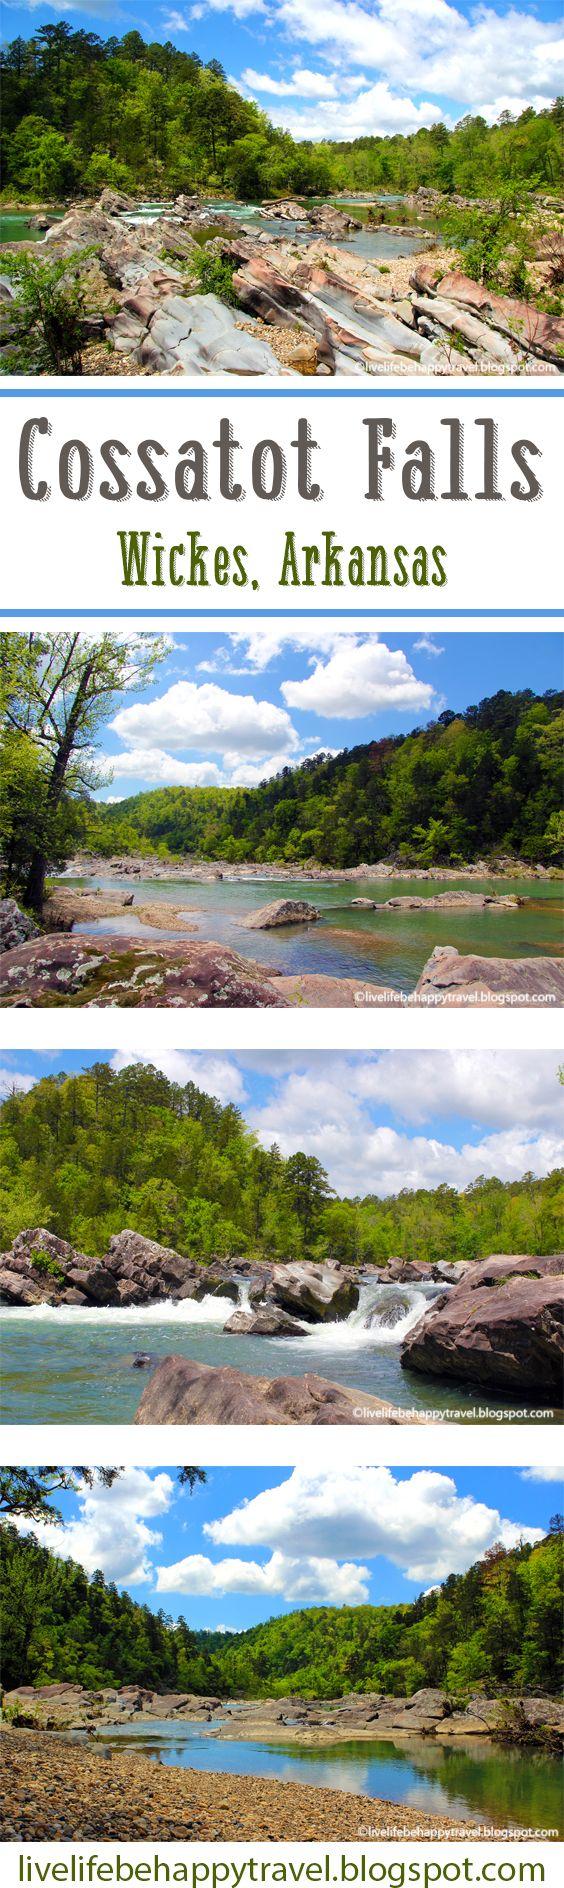 A Must Visit in Southwest Arkansas - Cossatot Falls - Cossatot River